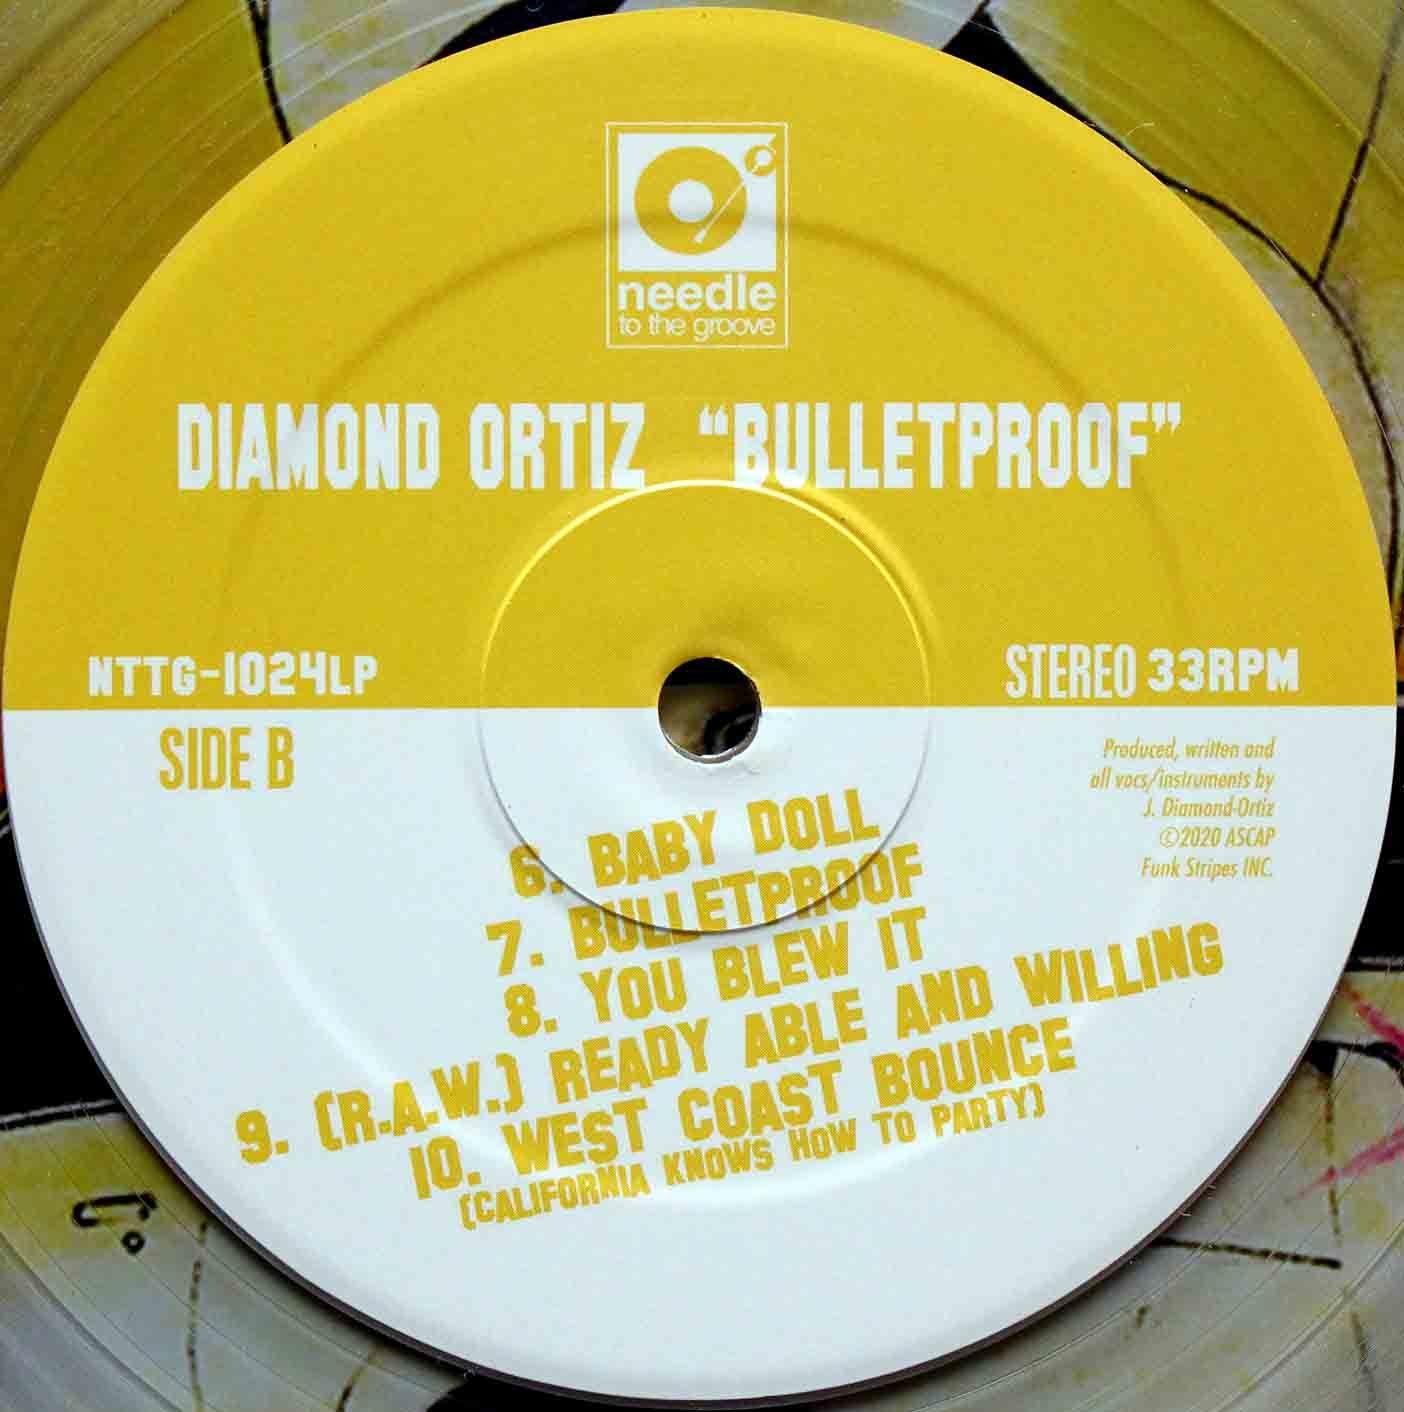 Diamond Ortiz Bulletproof 04